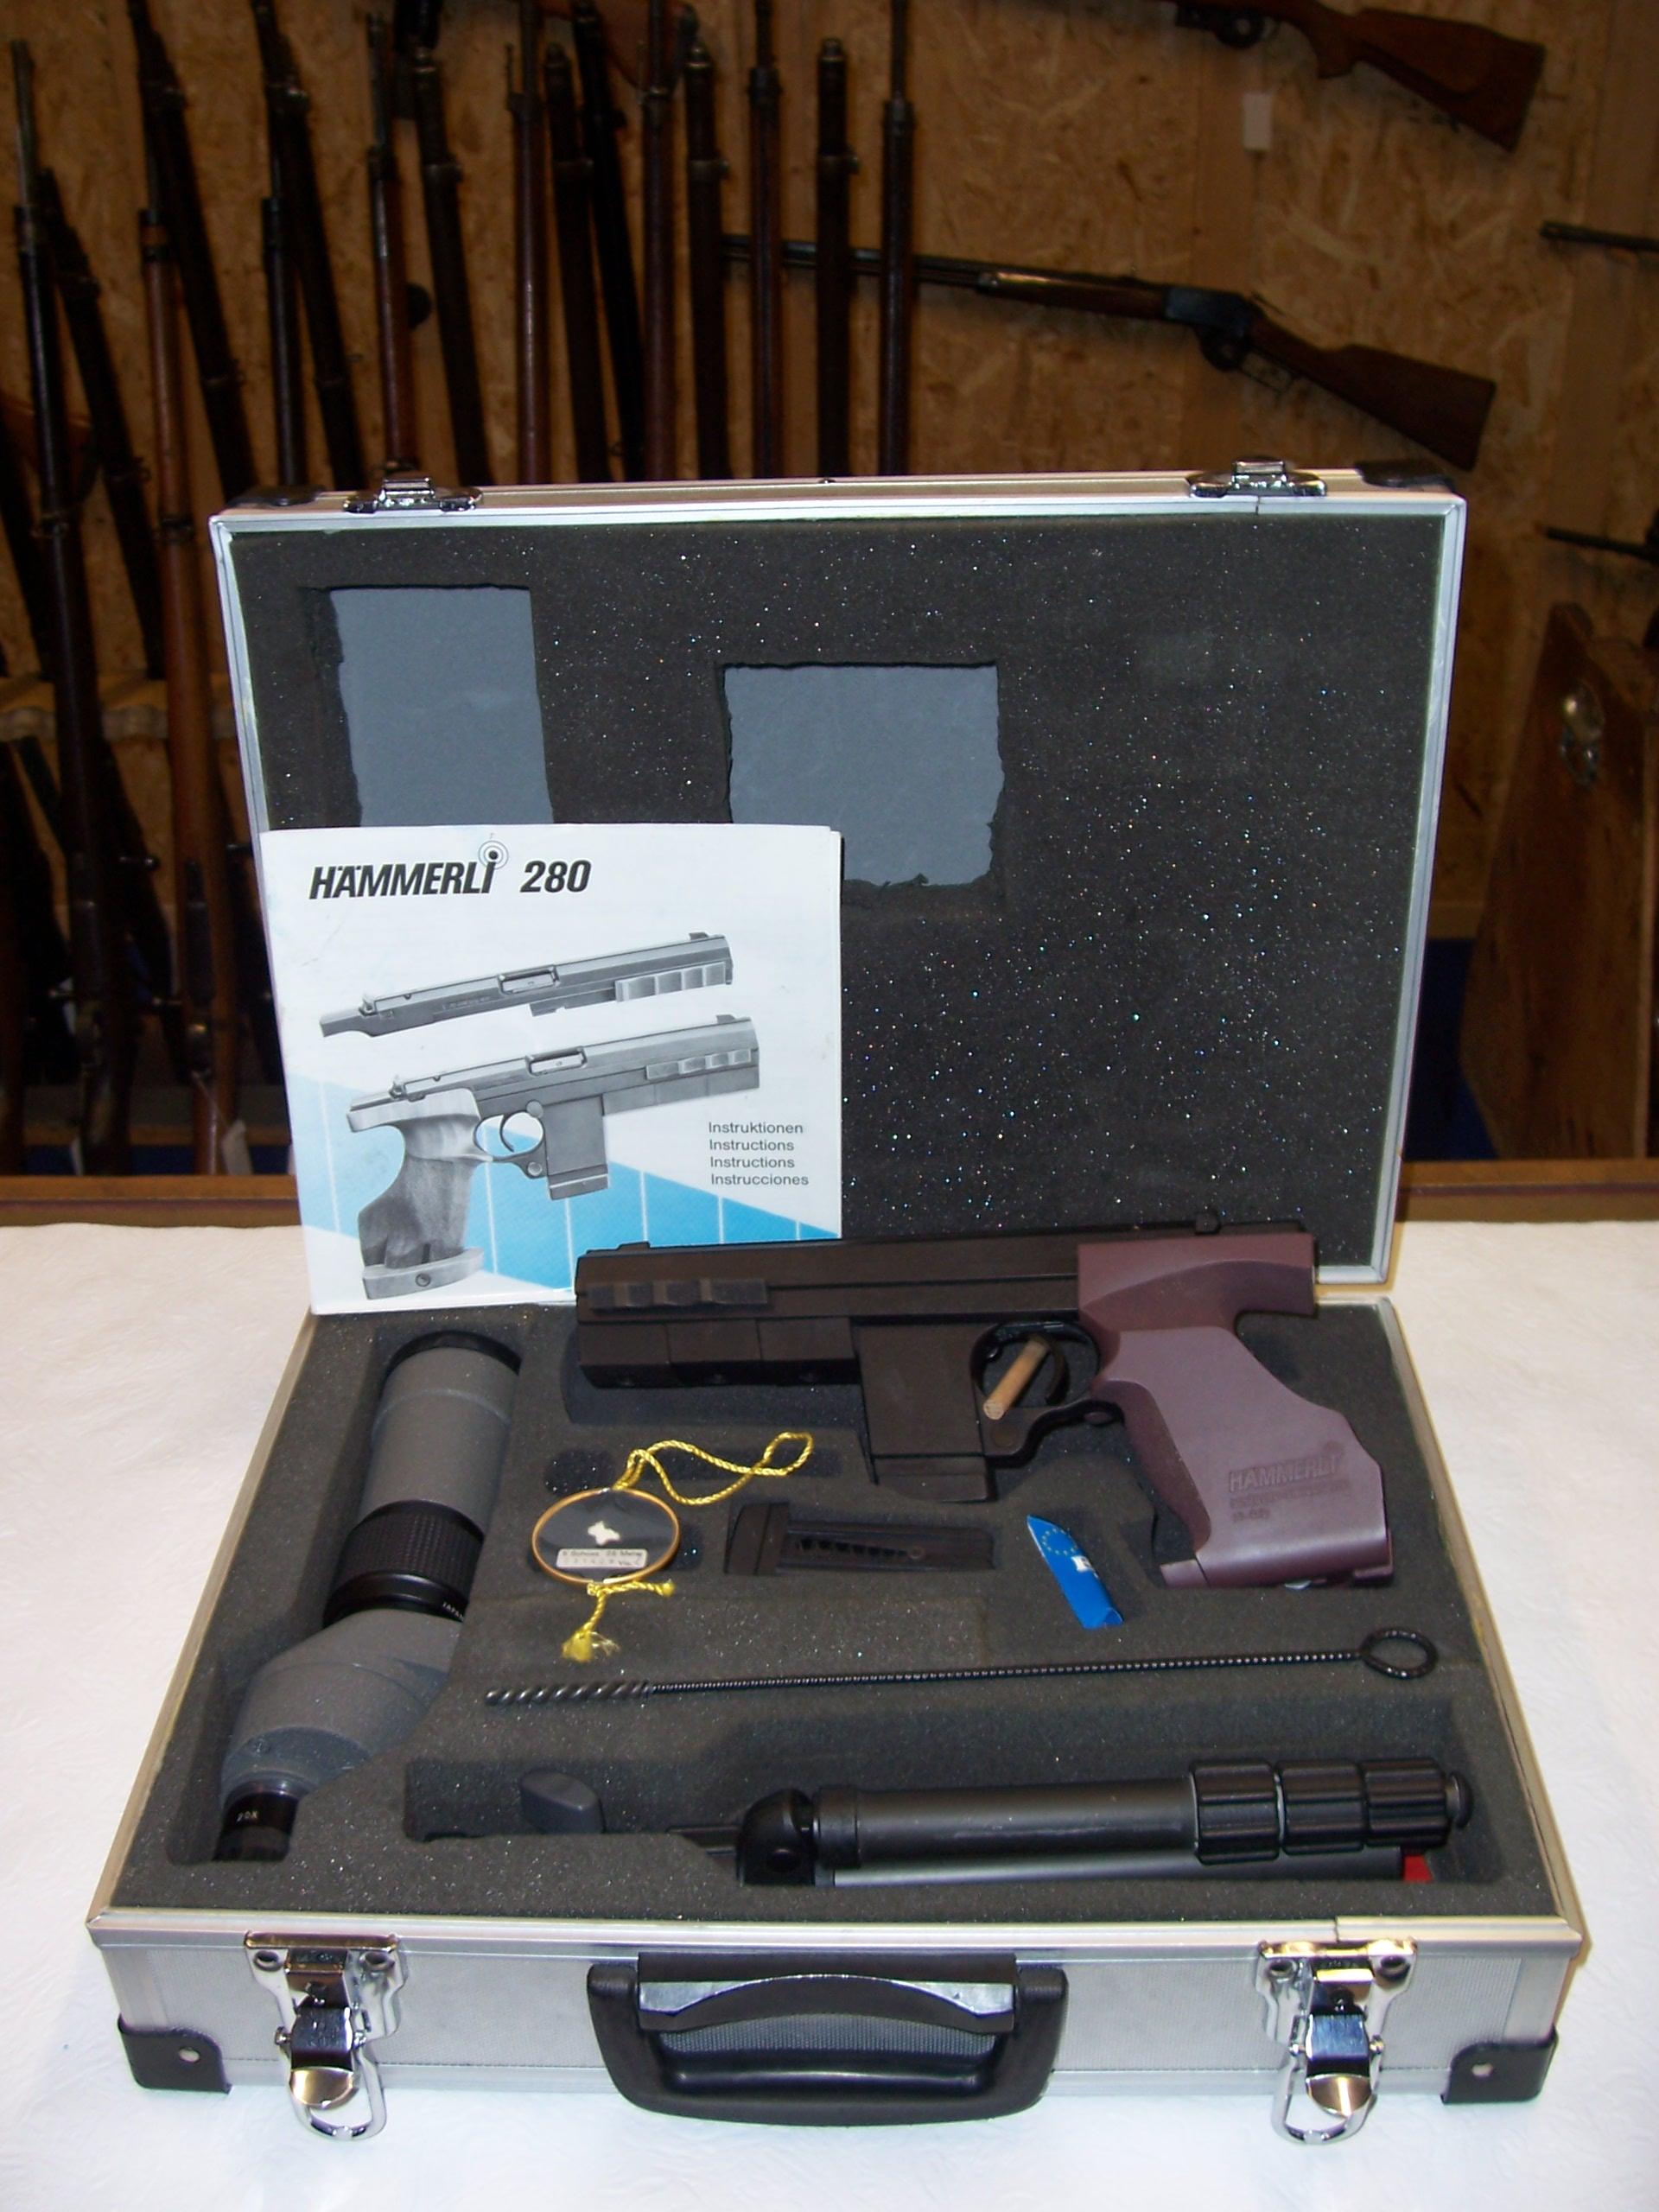 sportpistole h mmerli im kaliber 22l r inkl zubeh r paket made in switzerland. Black Bedroom Furniture Sets. Home Design Ideas